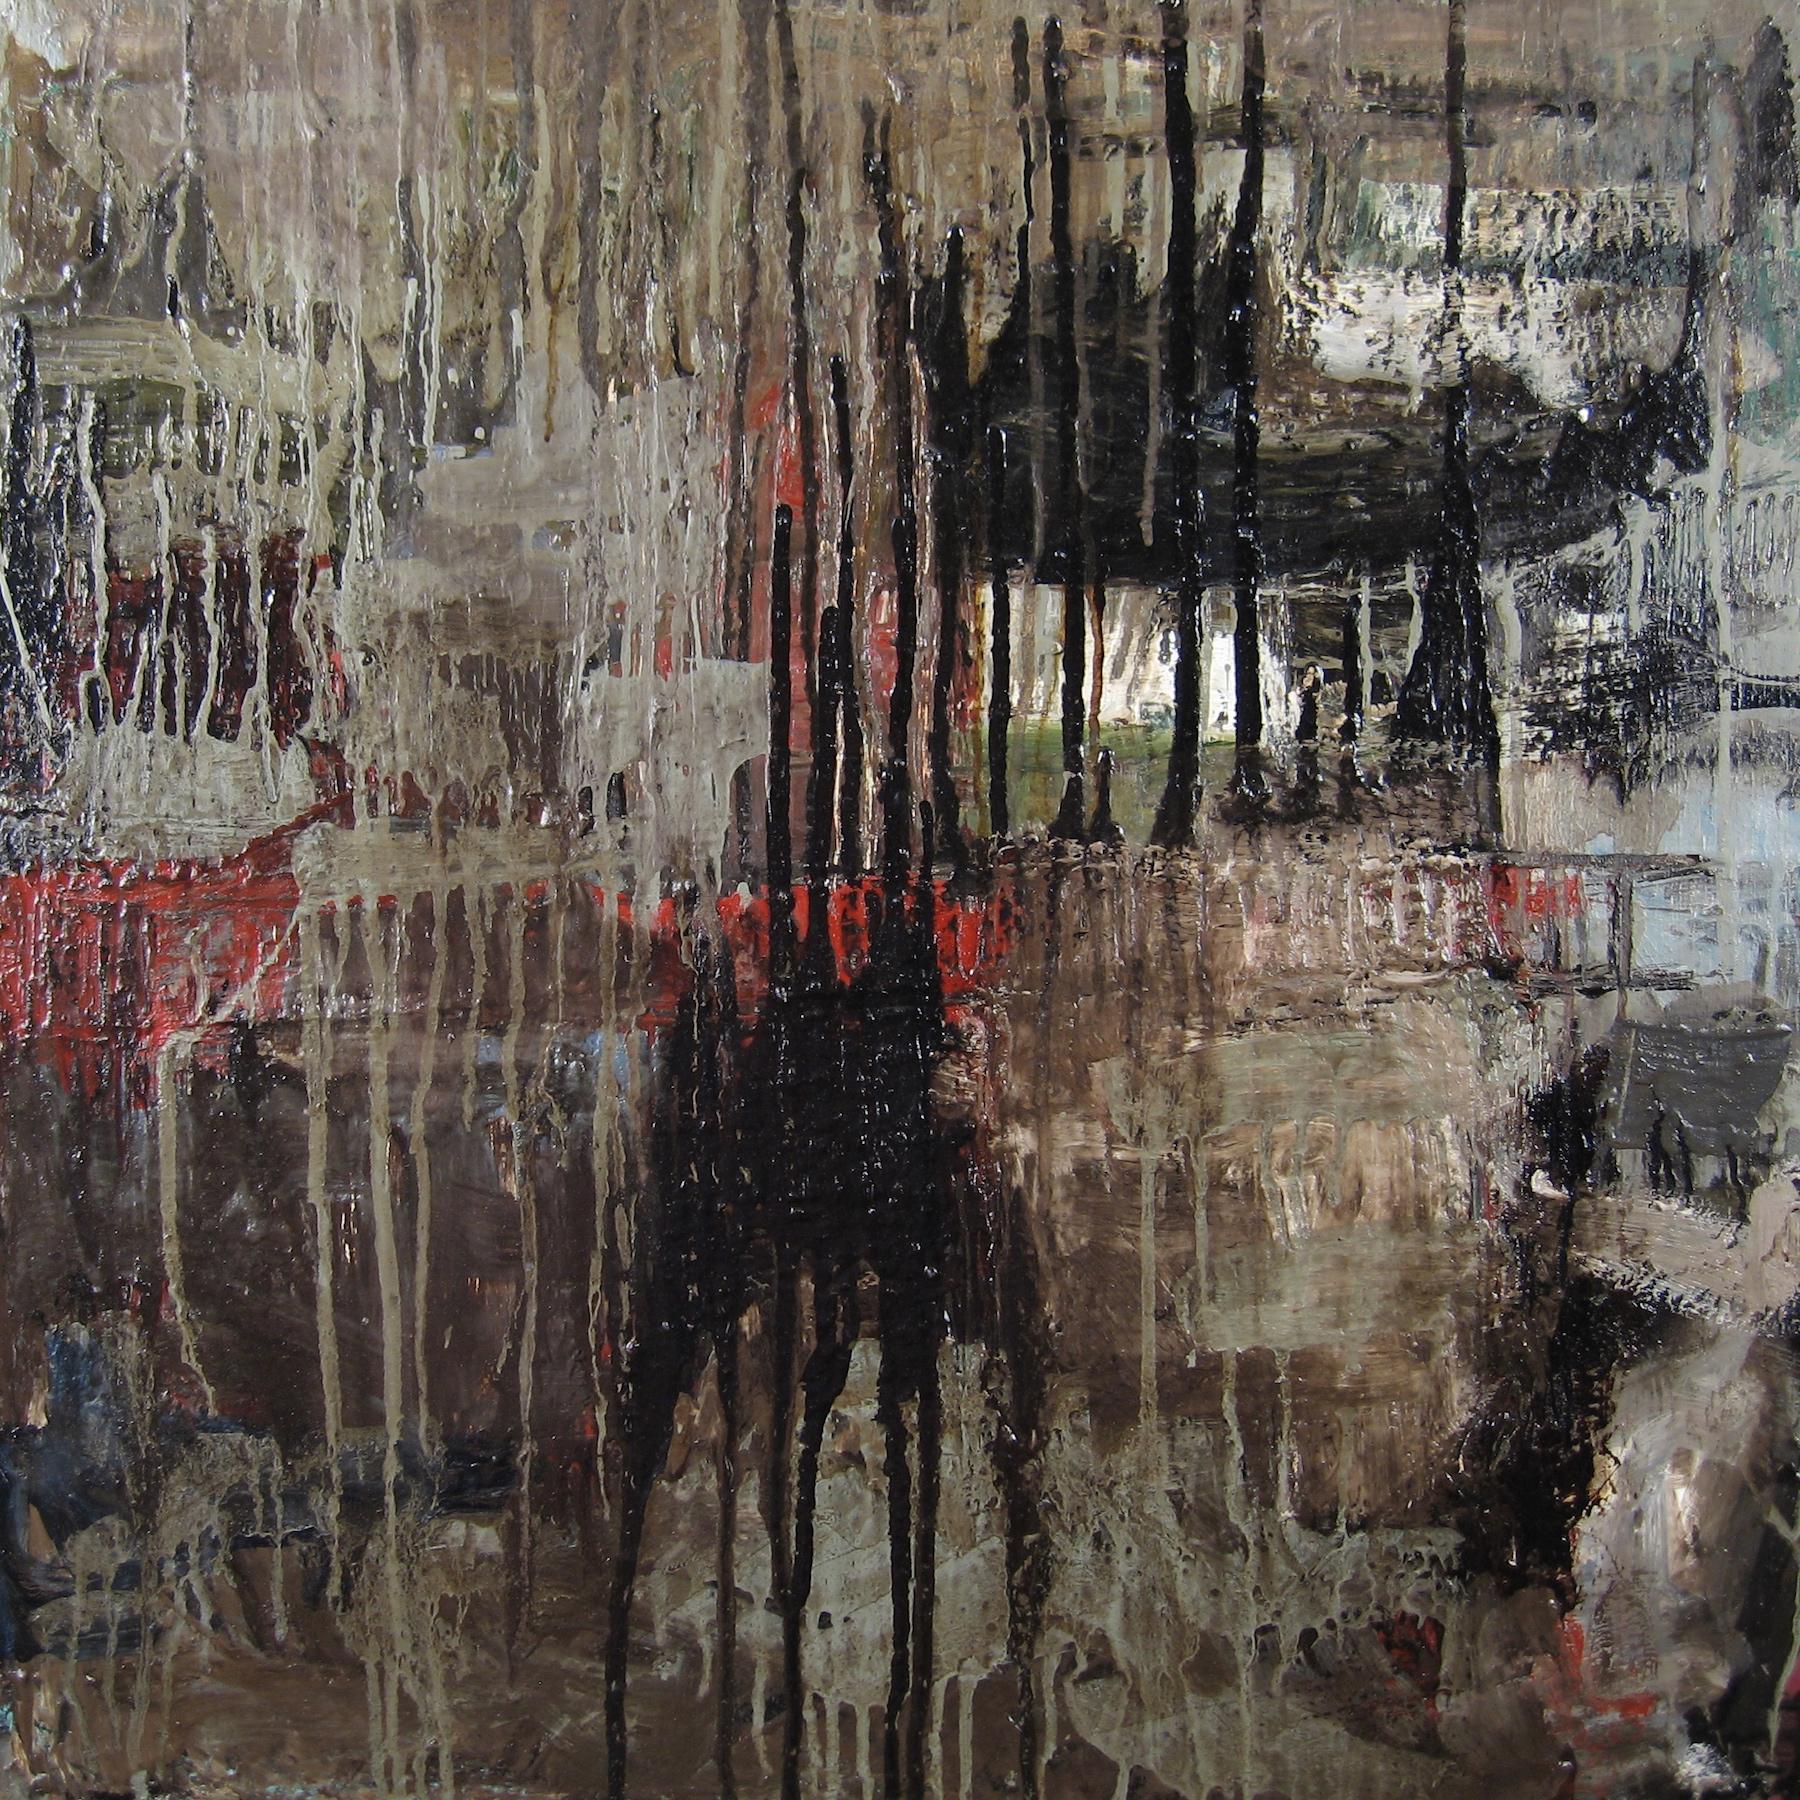 Leslie Zelamsky, Ayeka II: Where Are You?, mixed media, 24x24, $1,500